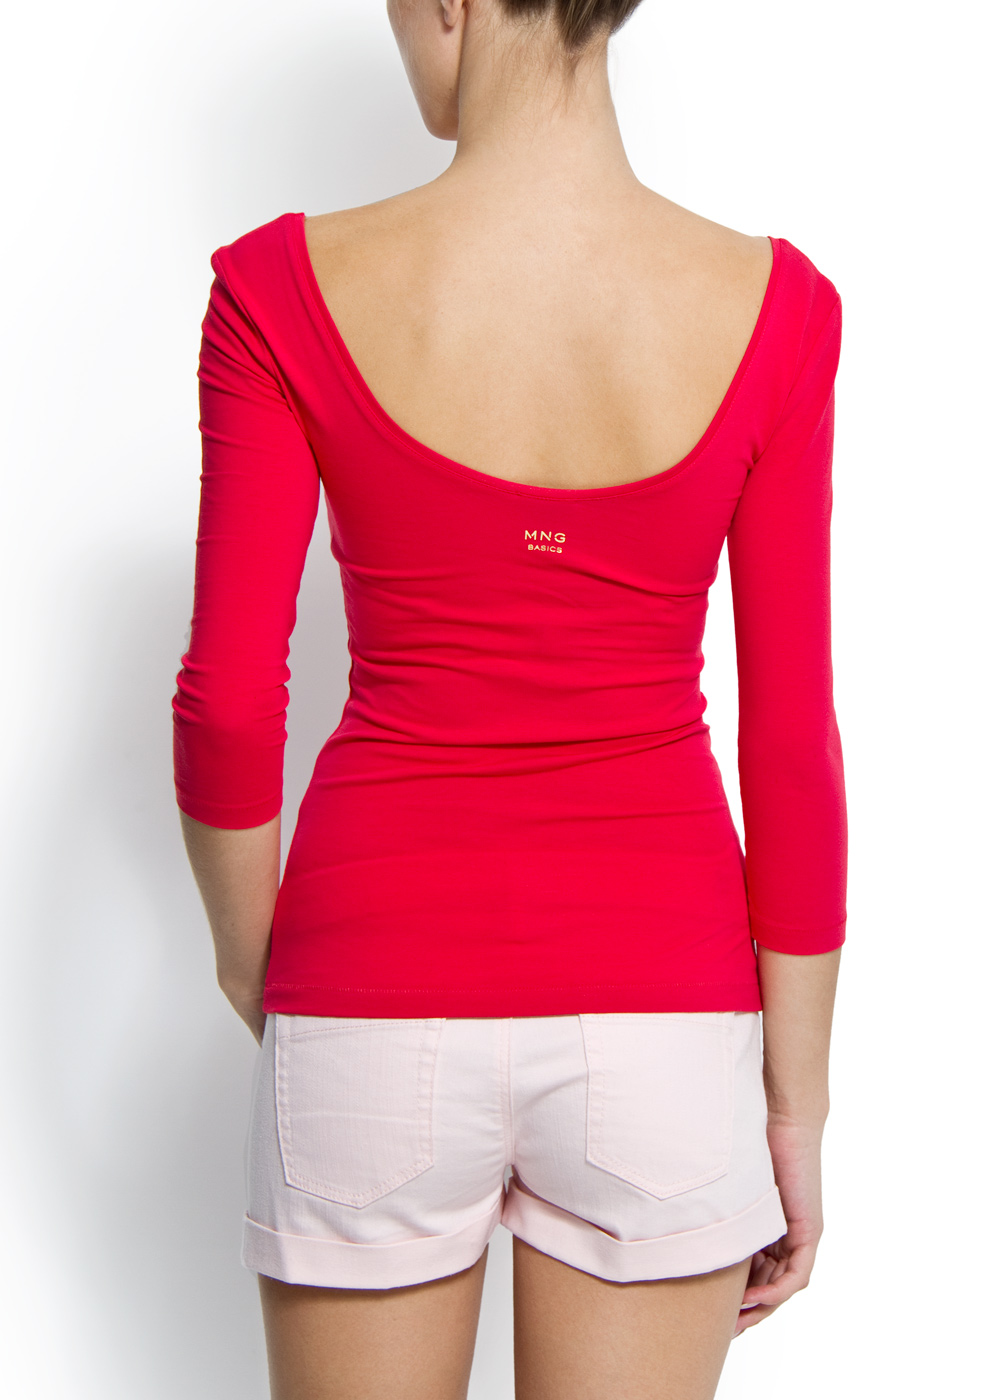 Lyst - Mango Slim-fit Scoop Neck T-shirt in Pink